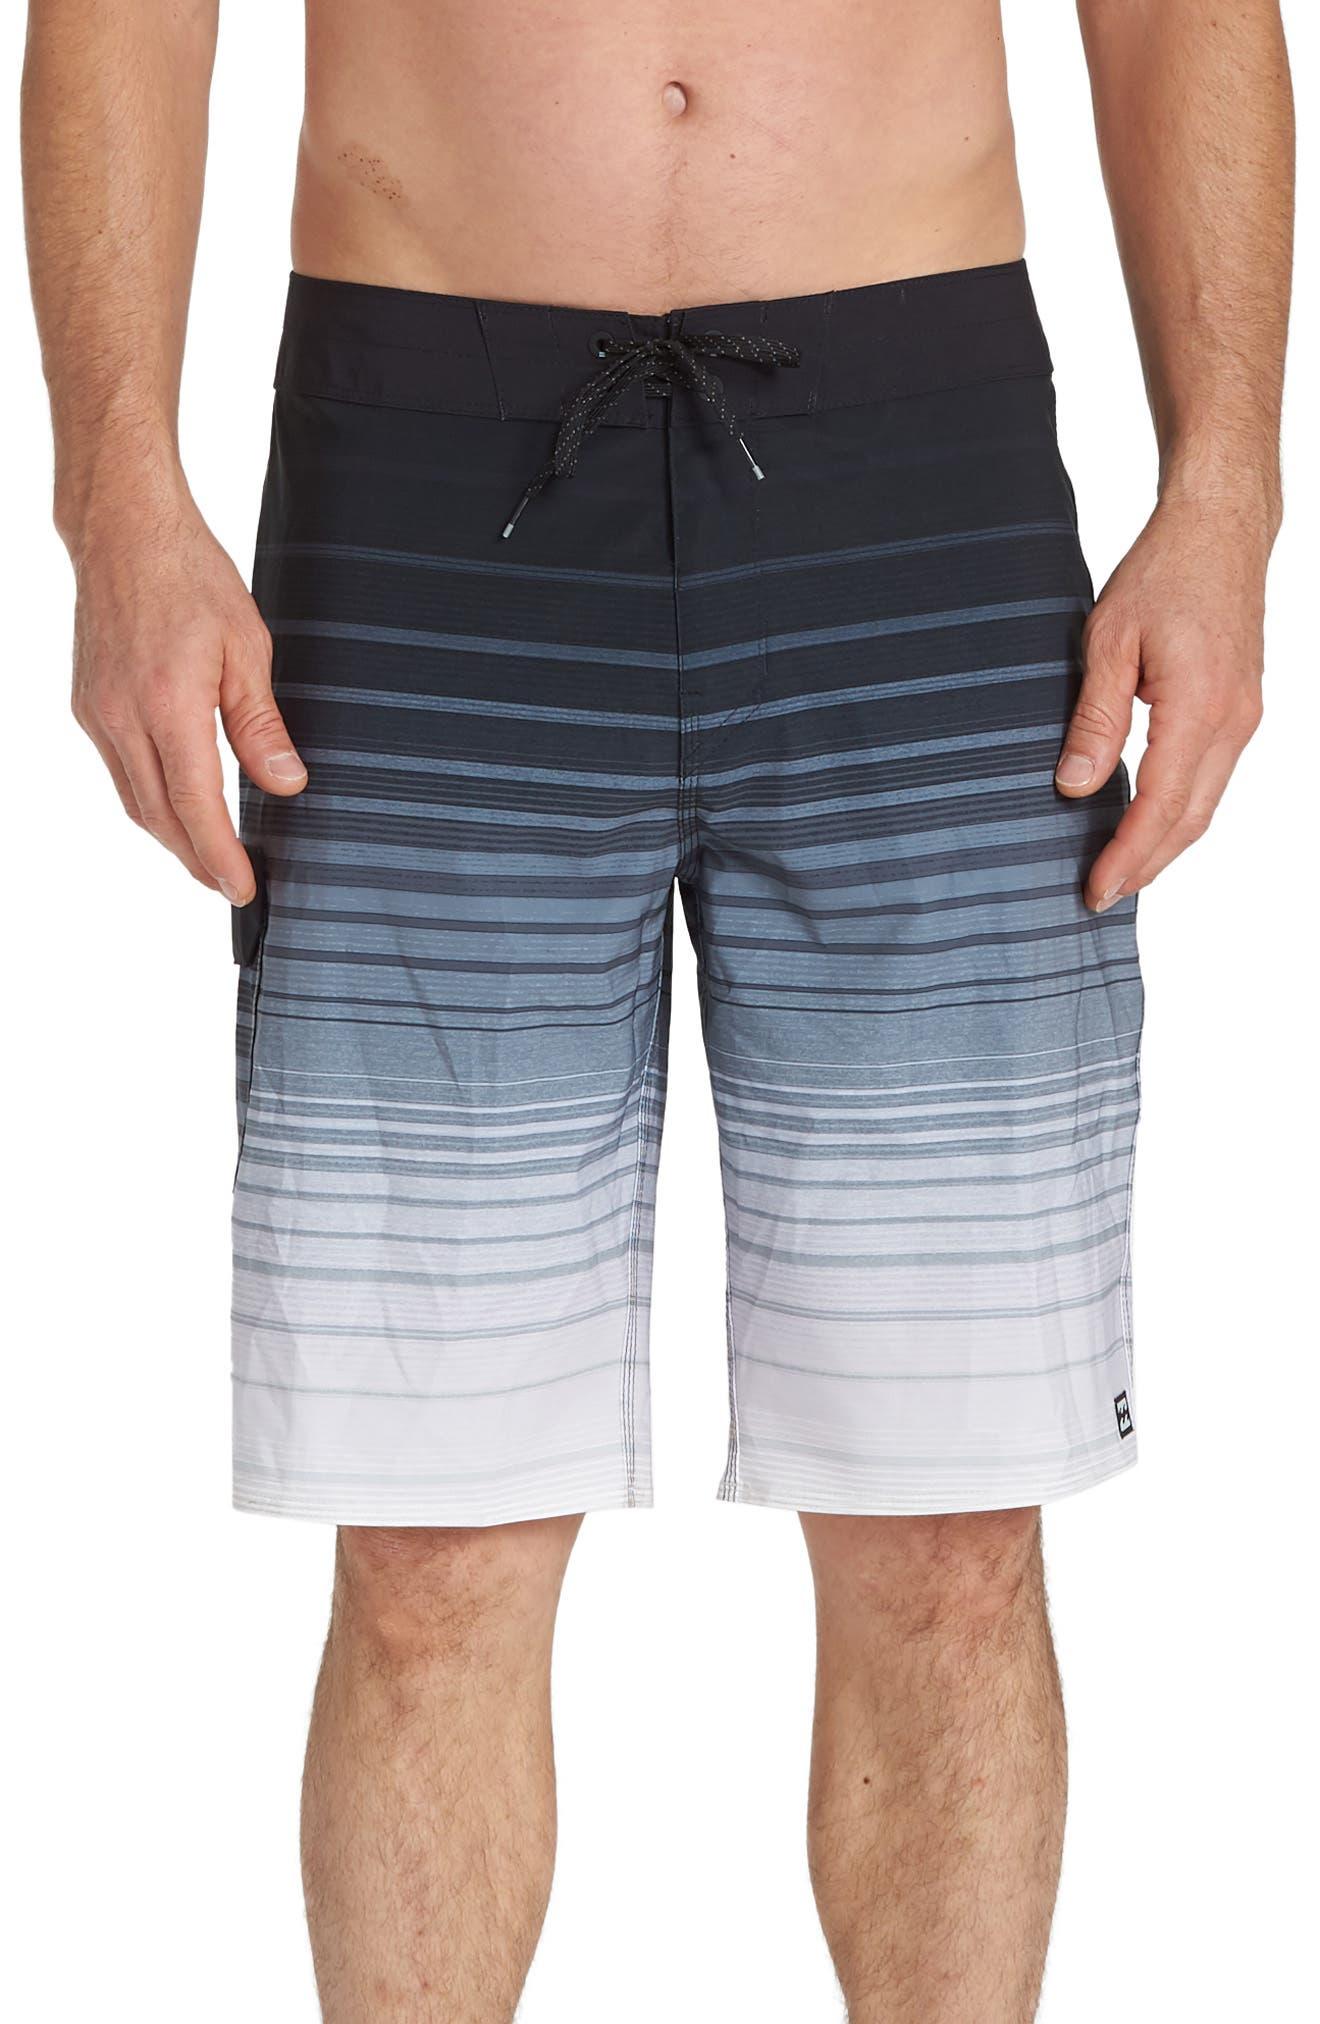 Billabong All Day Stripe Pro Board Shorts, Black